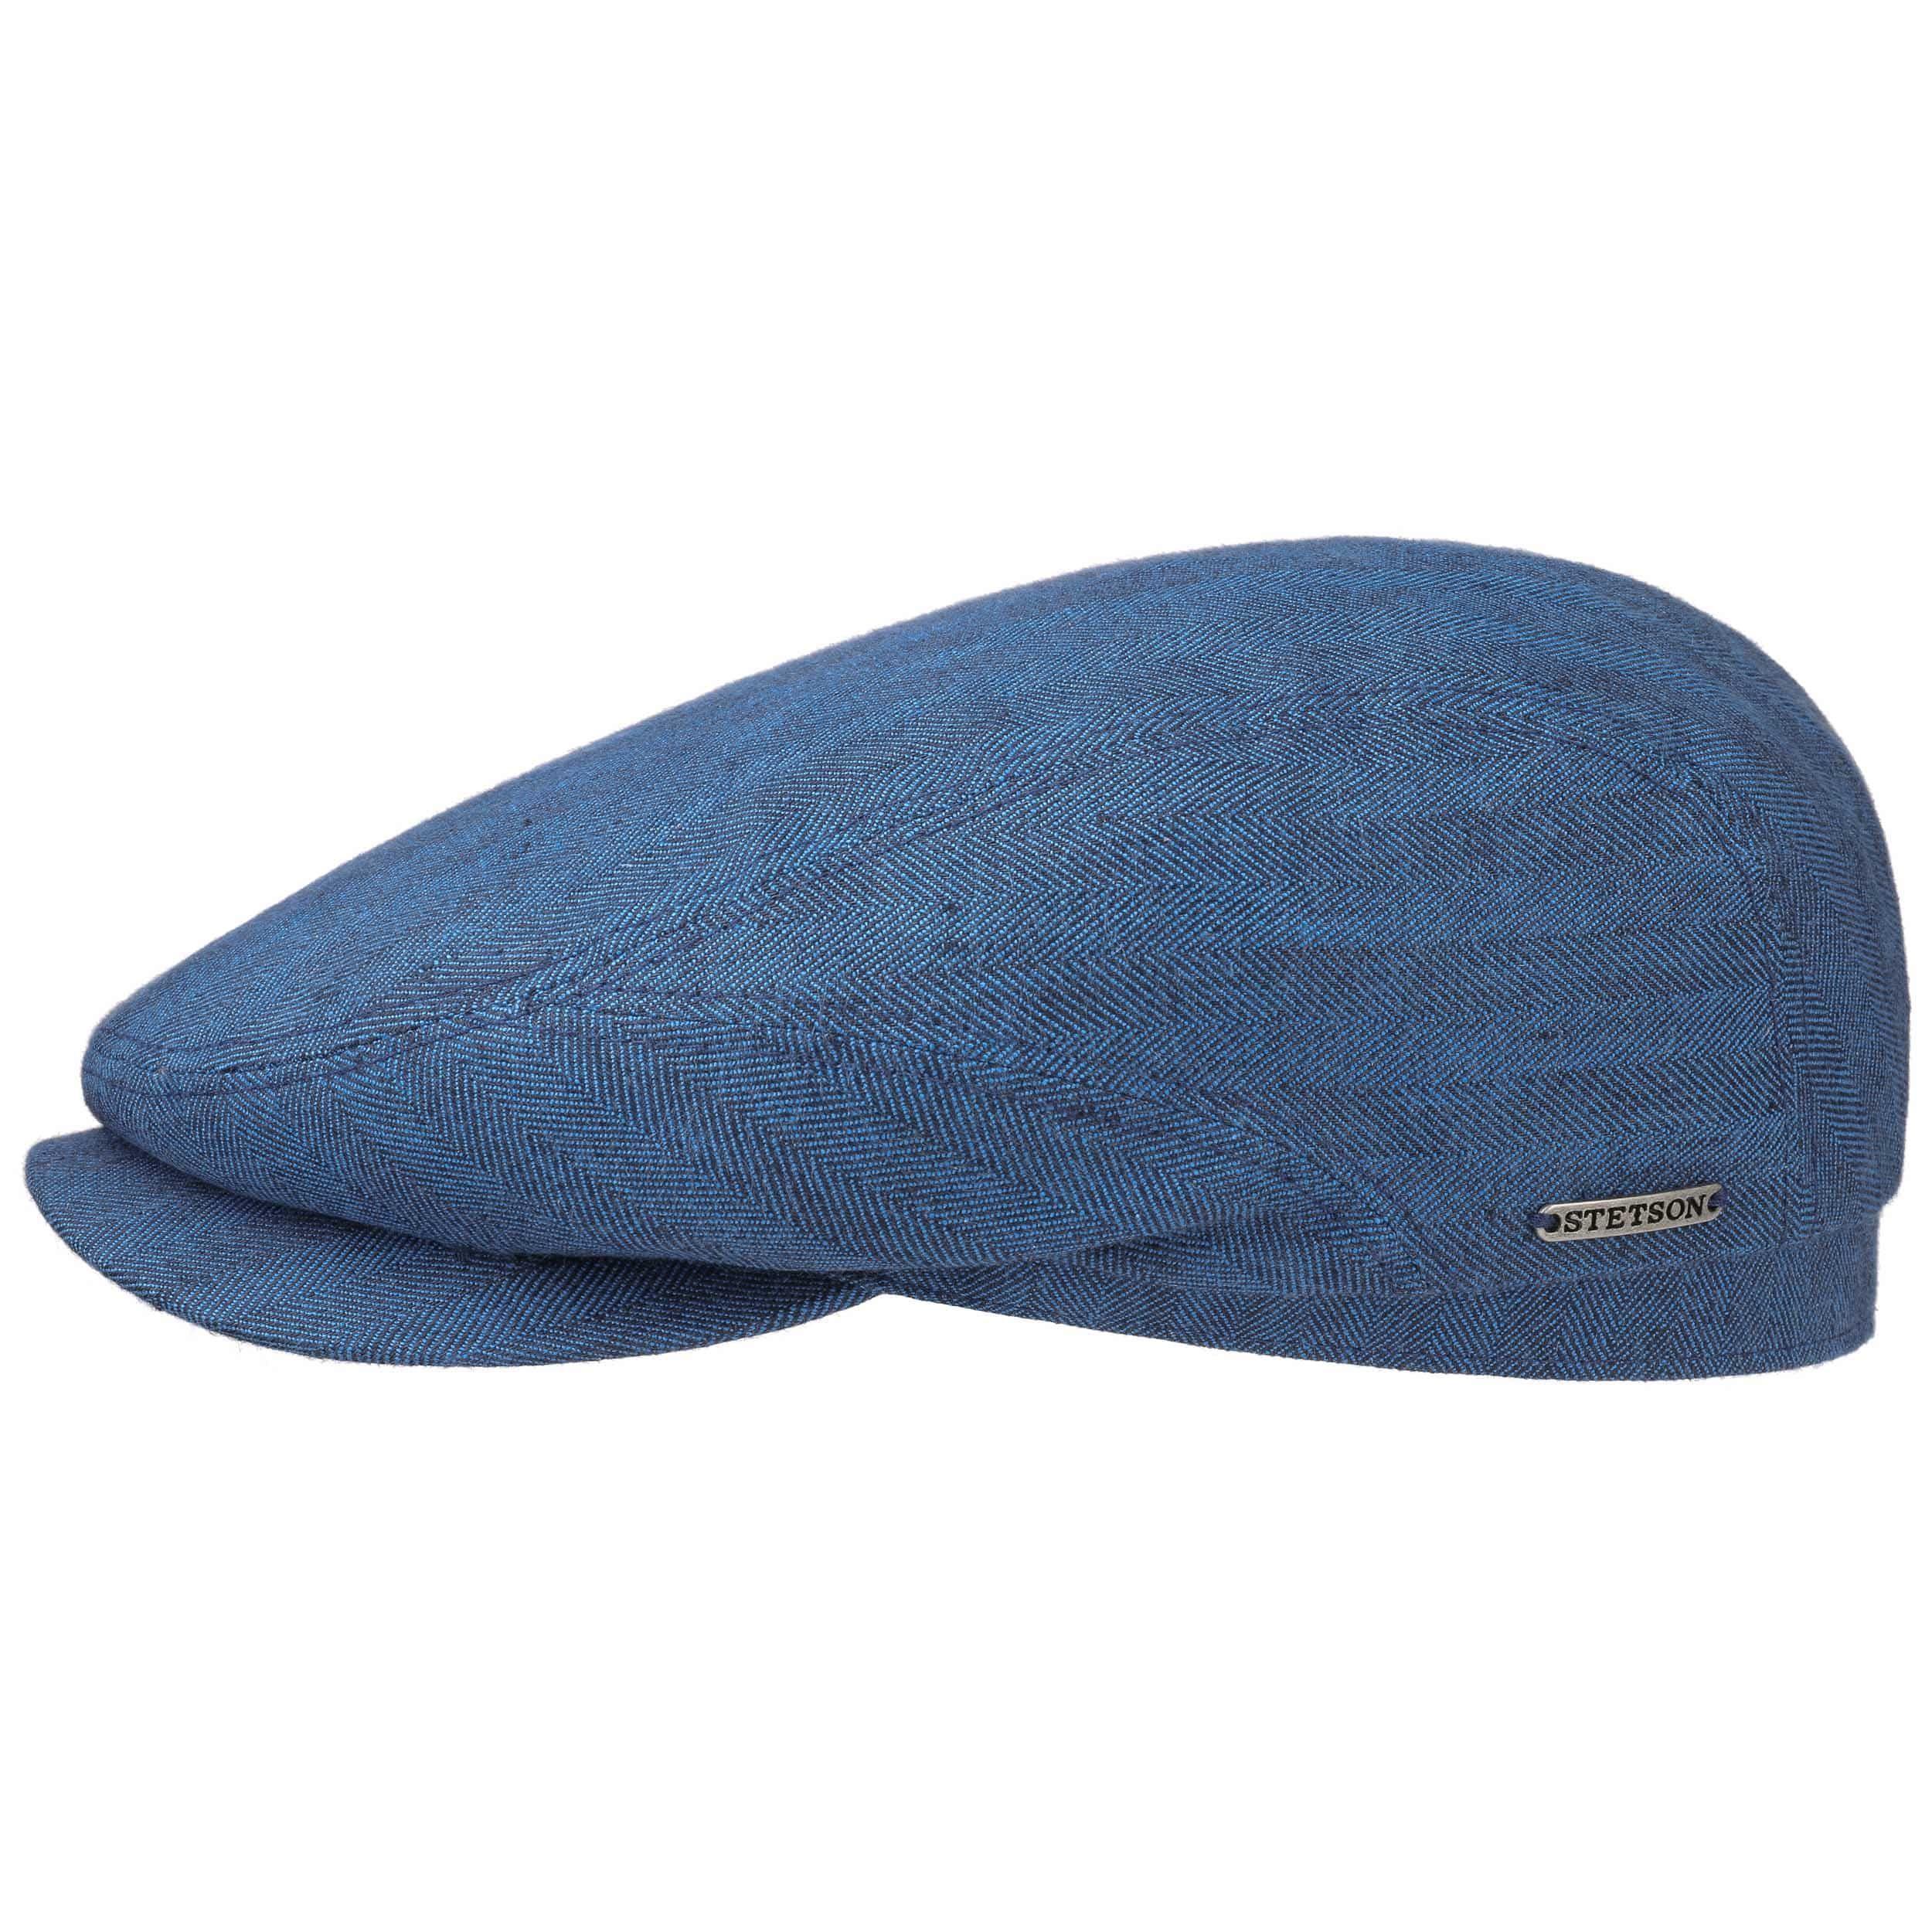 Belfast Cotton-Mix Flatcap blau